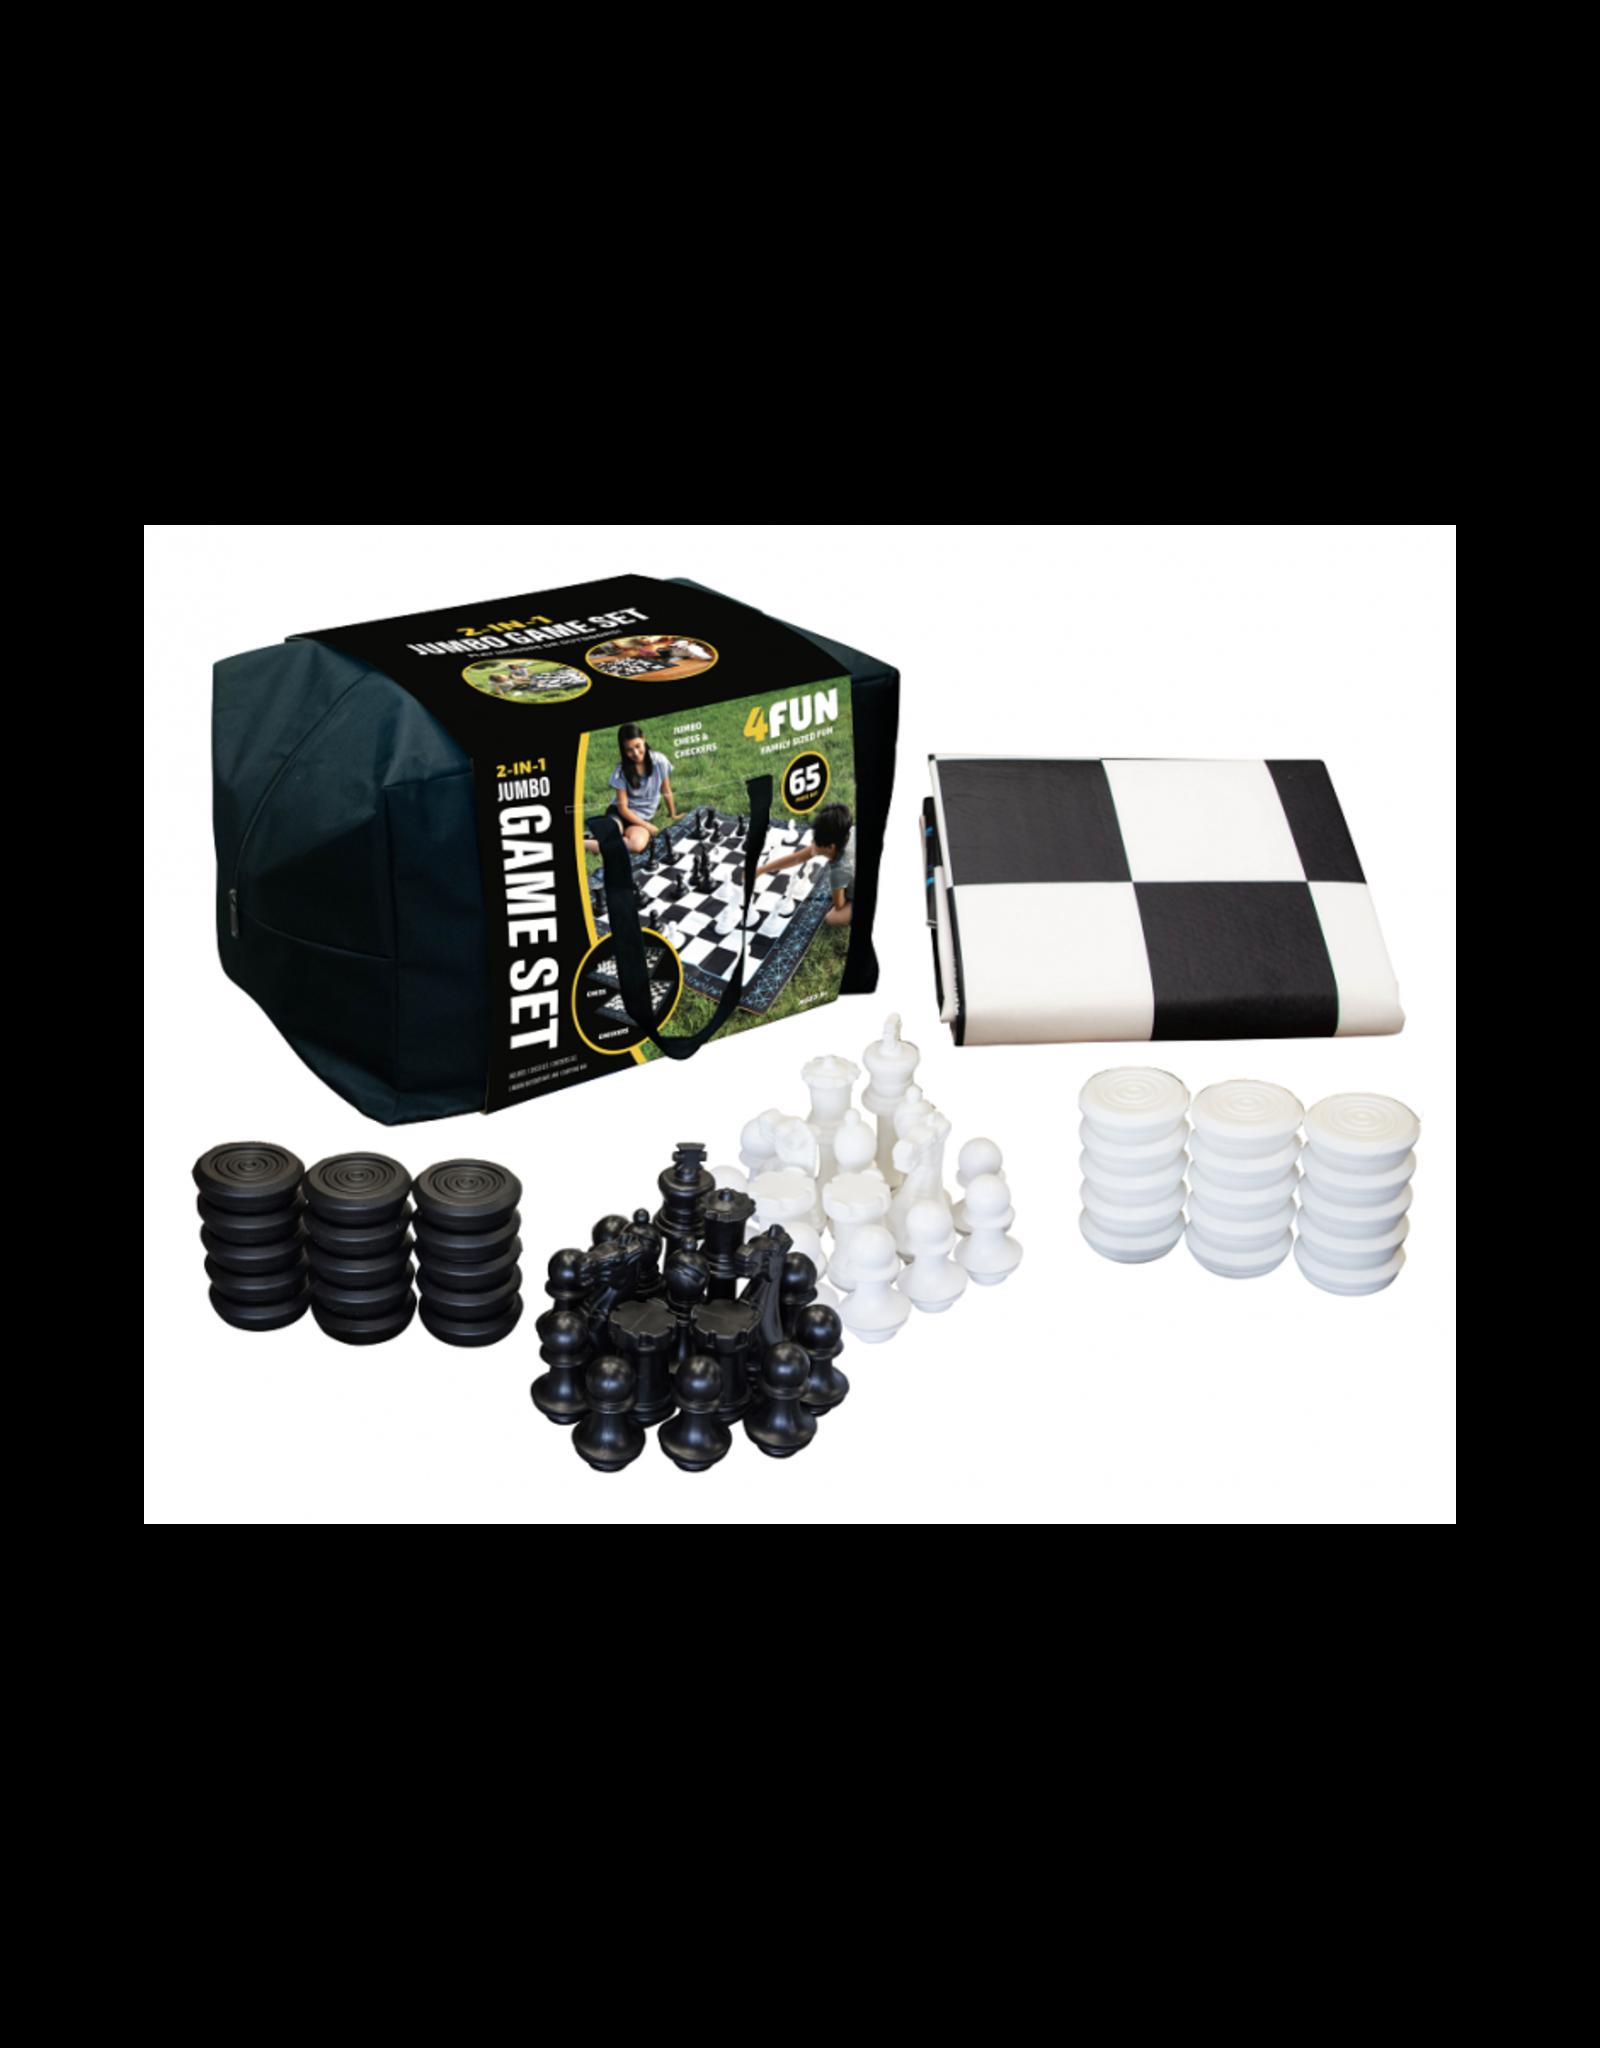 4FUN 2in1 Jumbo Chess and Checkers Set